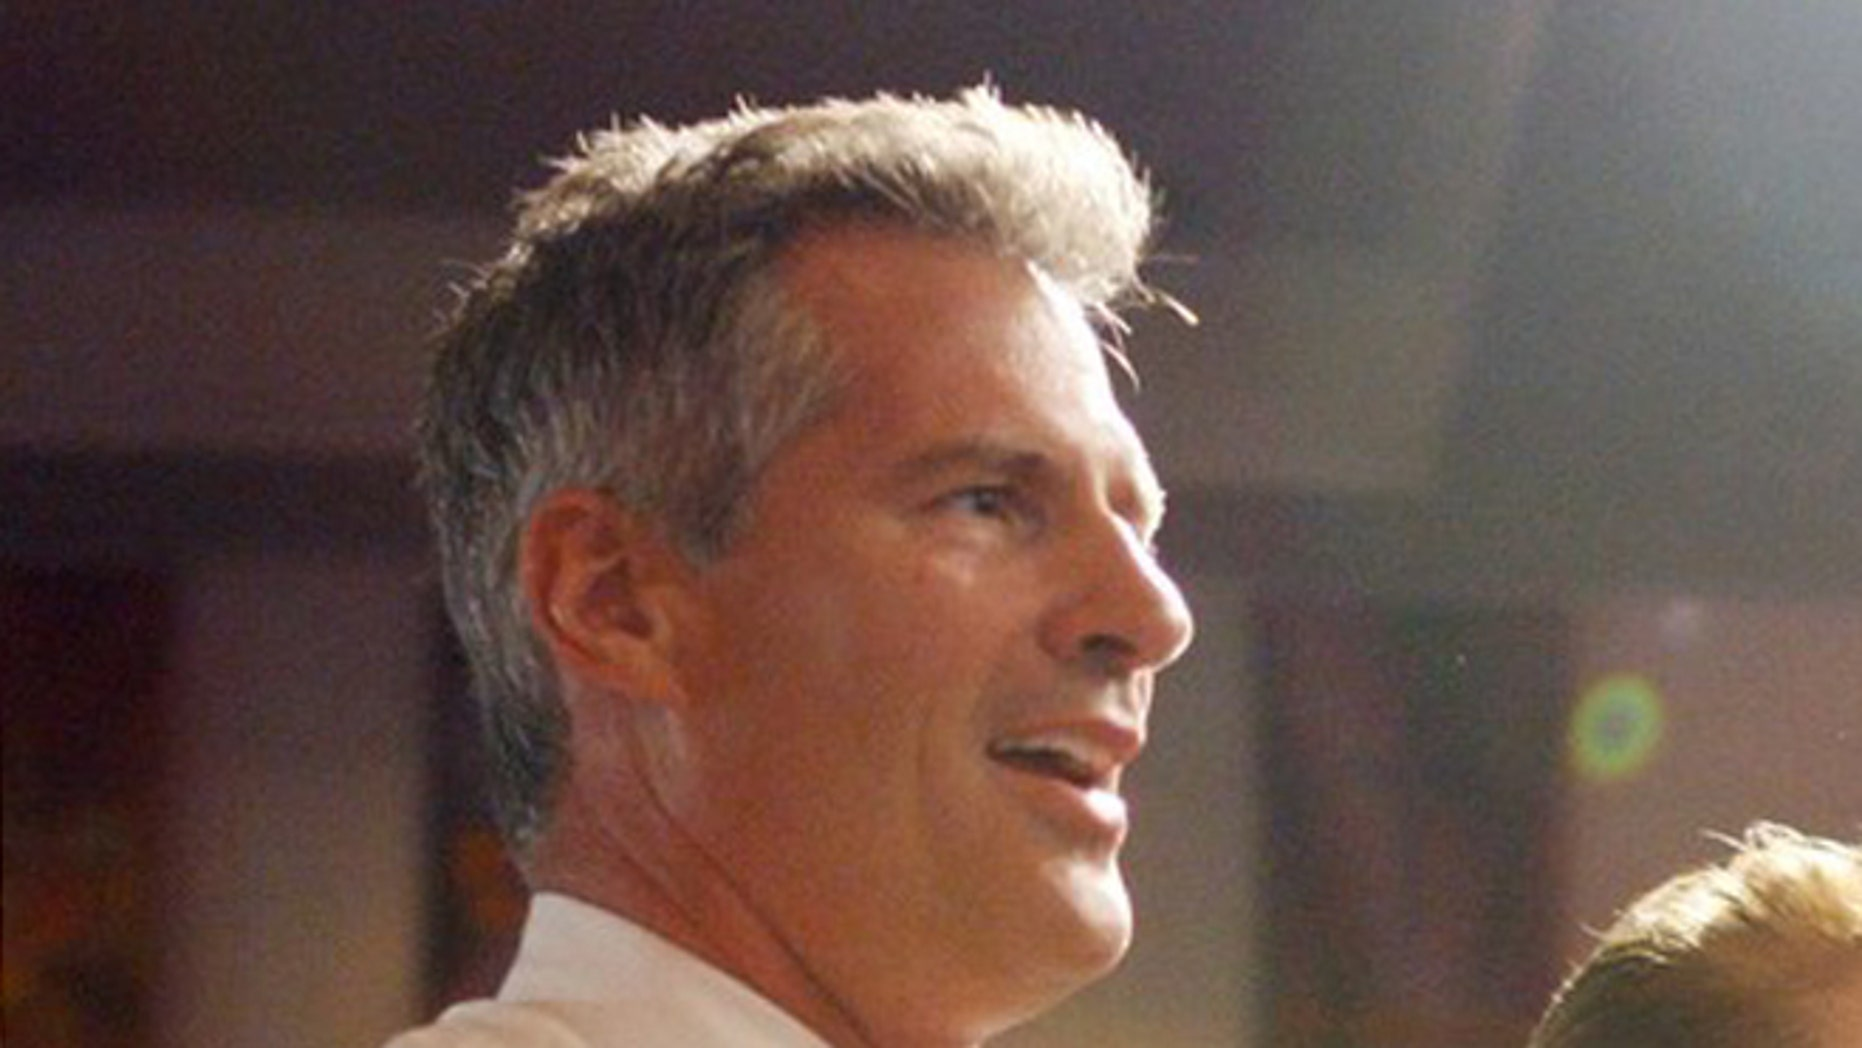 FILE: July 22, 2012: Then-Massachusetts Sen. Scott Brown, R, in the Mattapan neighborhood of Boston, Mass.